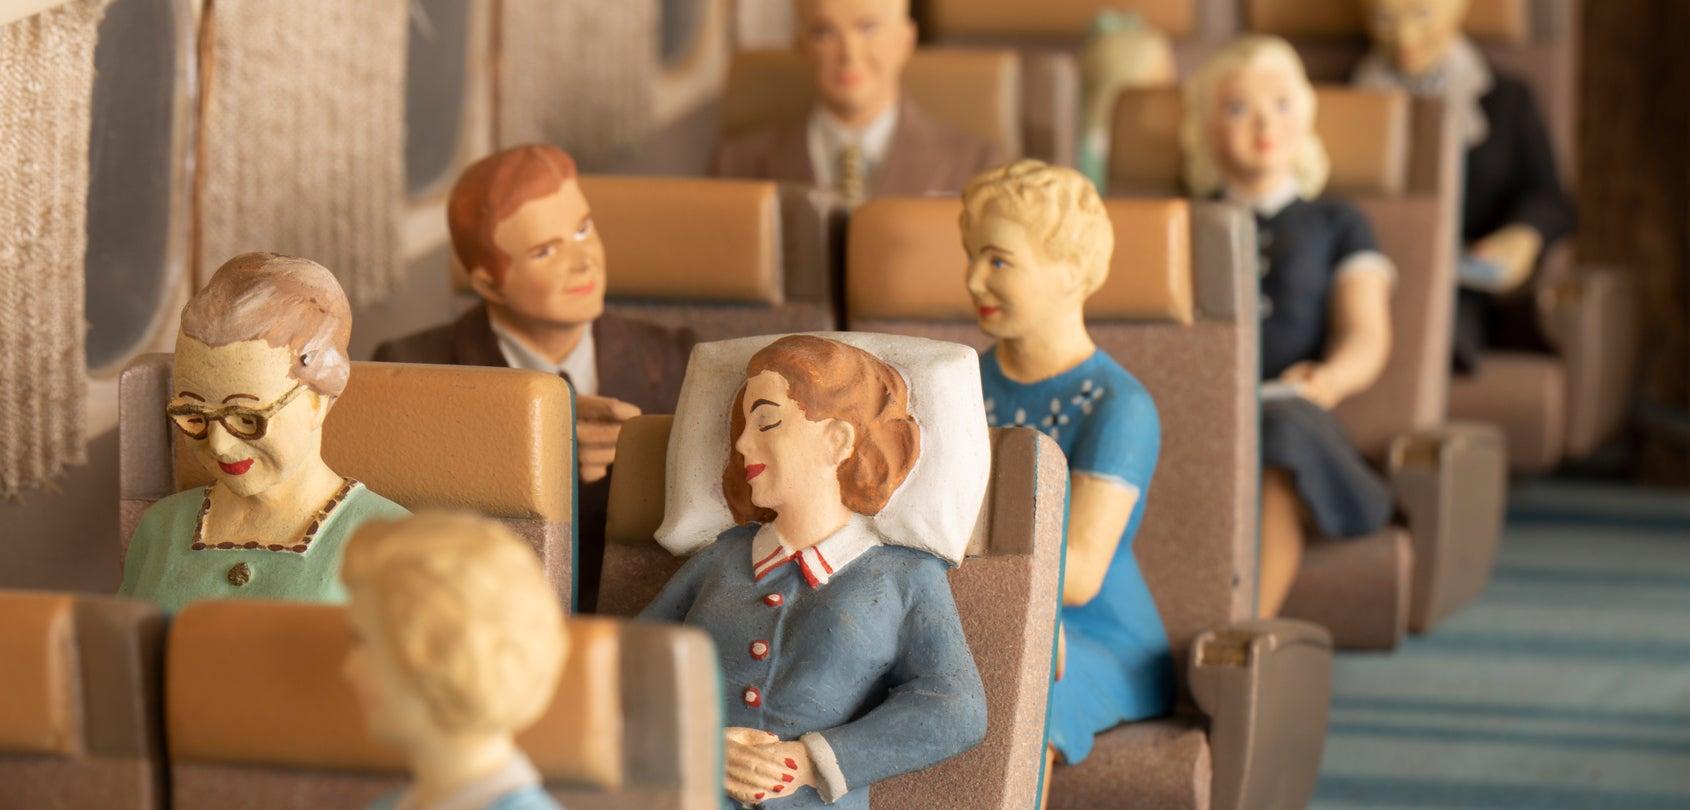 The Illusion of Flight: The United Air Lines Douglas DC-8 Cutaway Model Interior